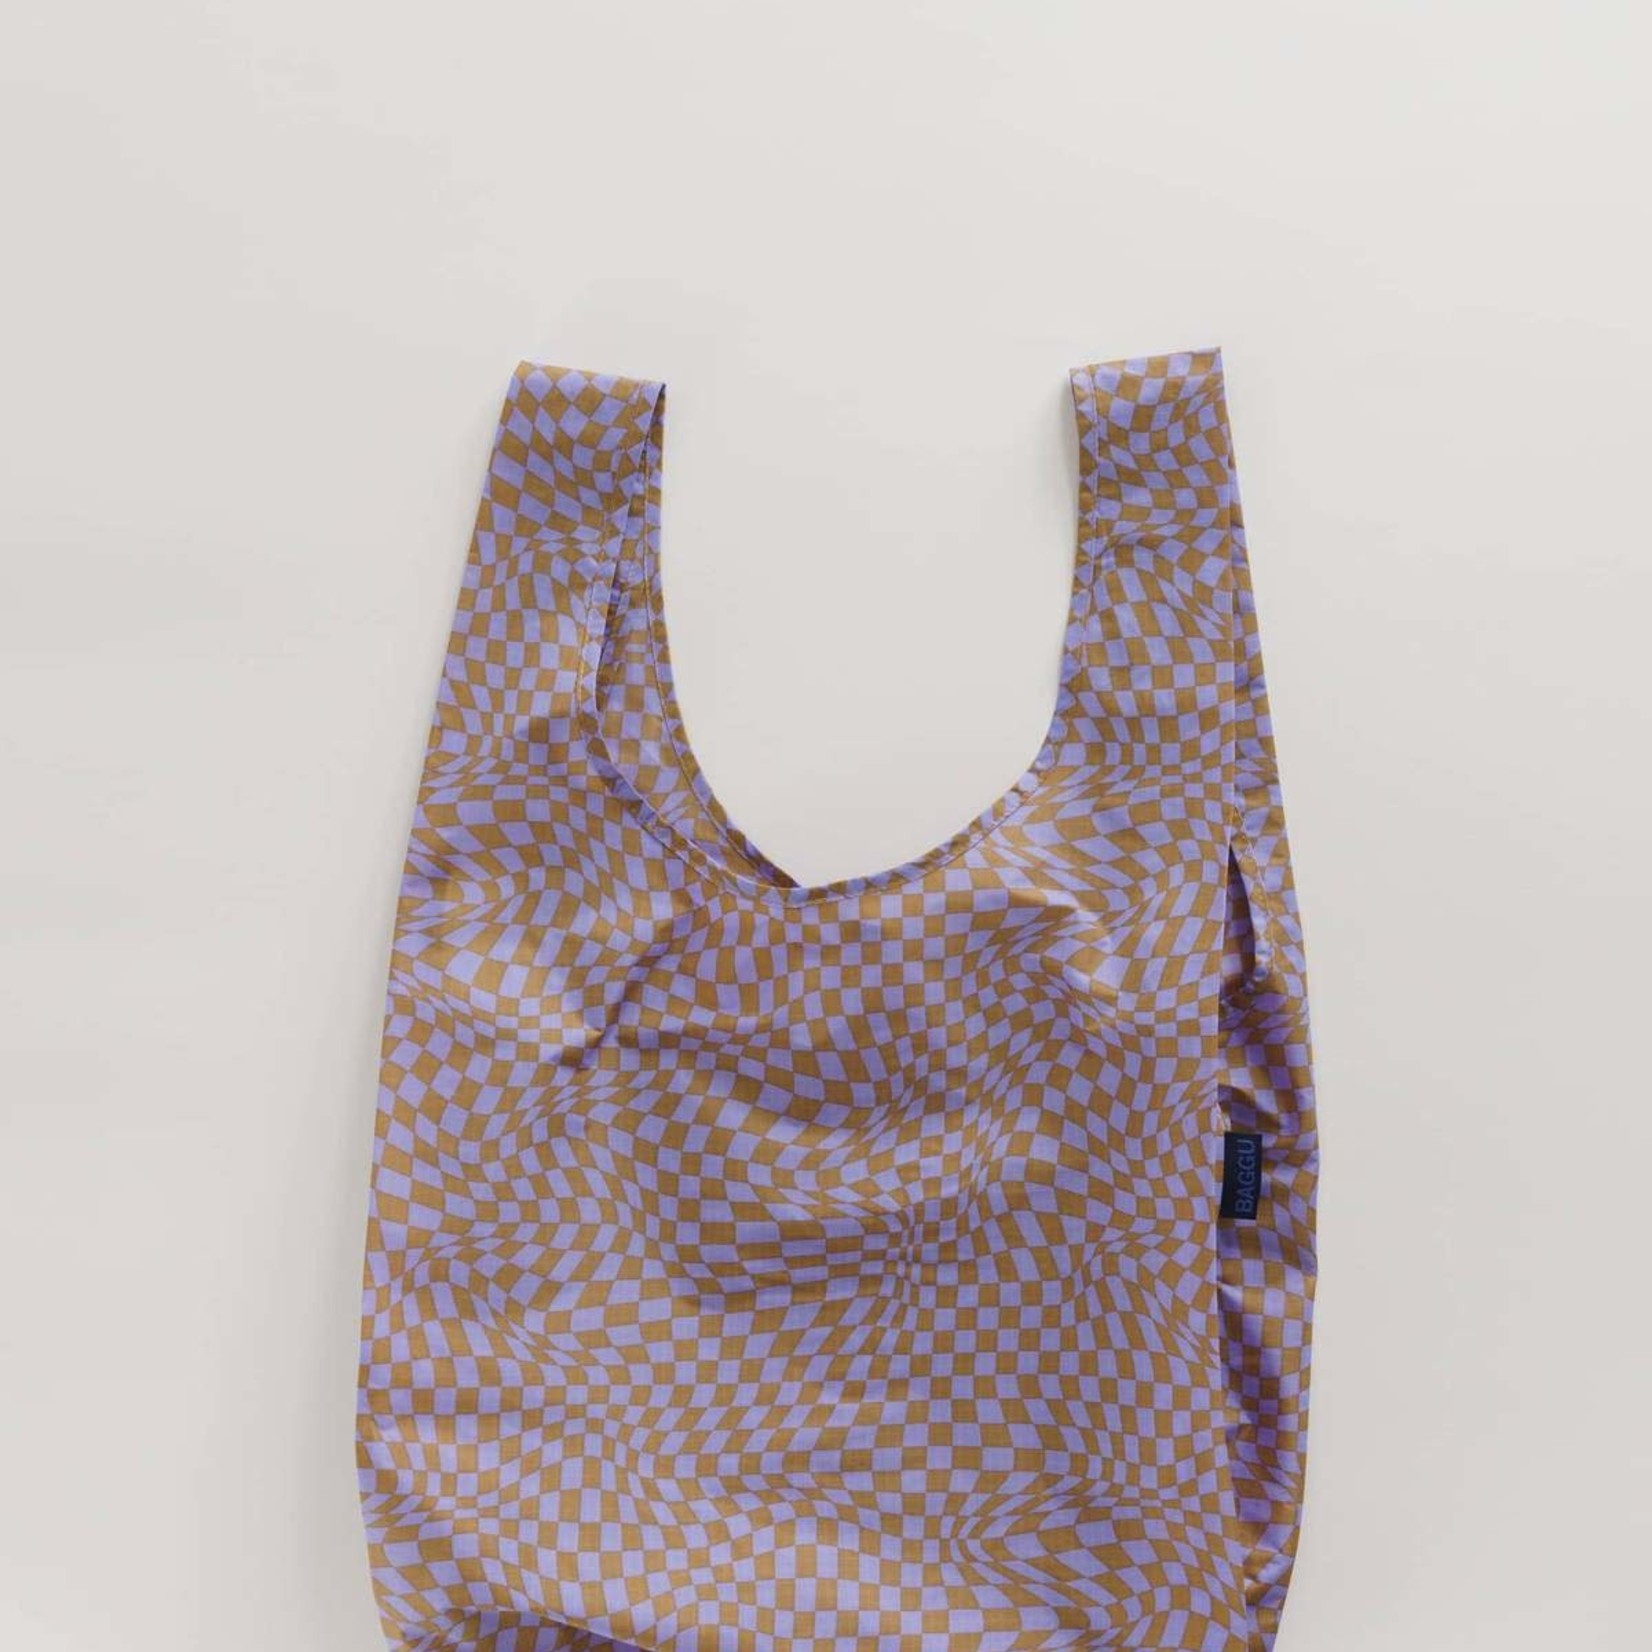 Baggu Baggu Reusable Bag Standard Lavender Trippy Checker